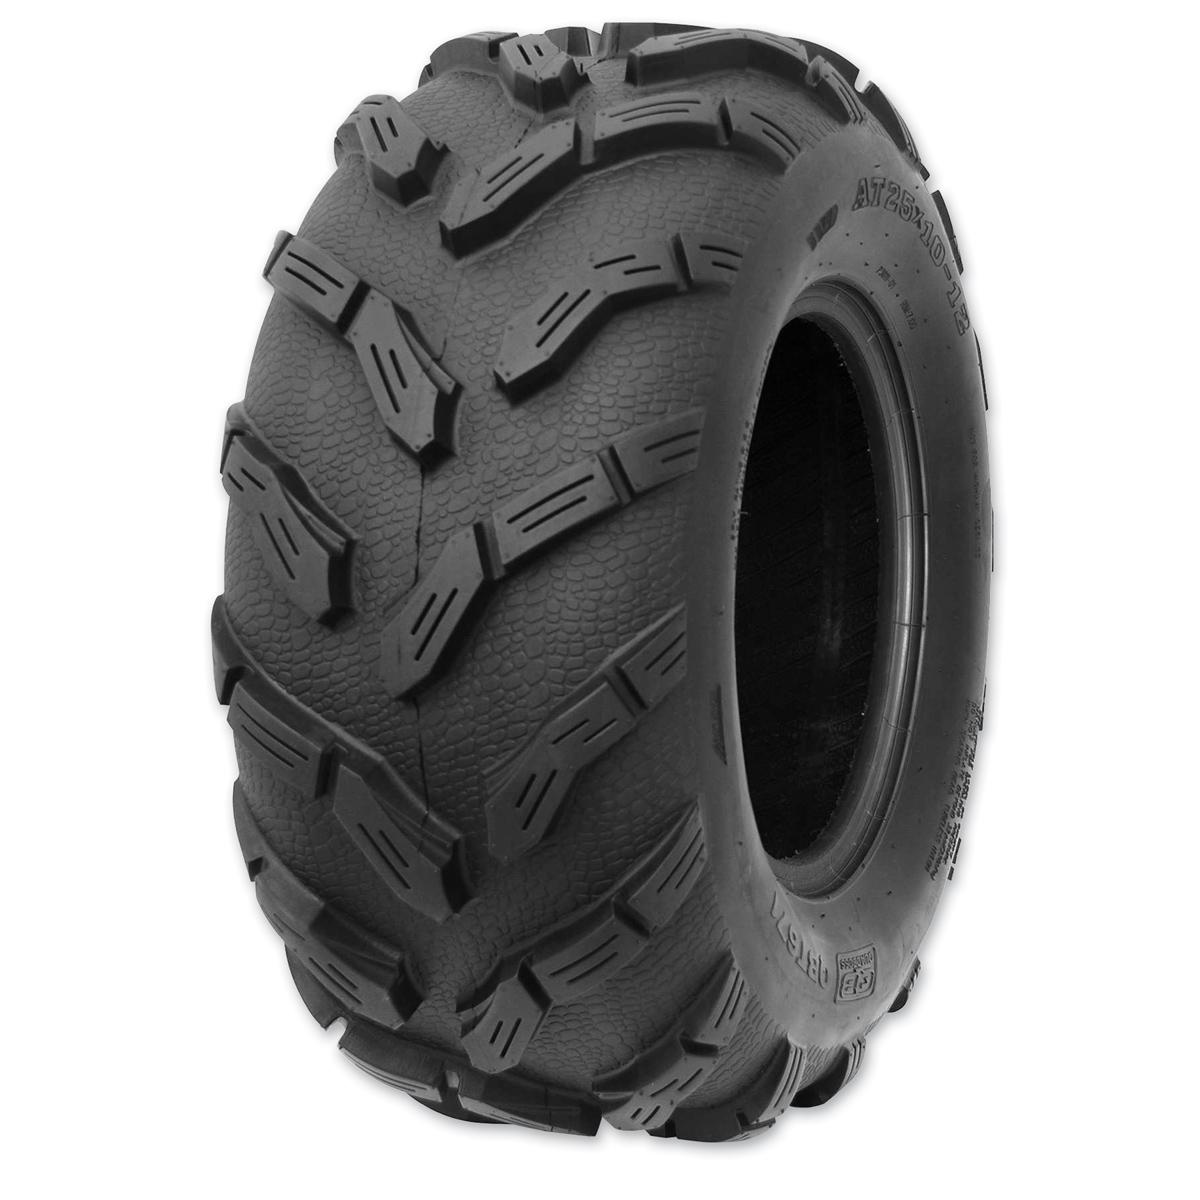 Quadboss QBT671 26X10-12 6-Ply Rear Tire